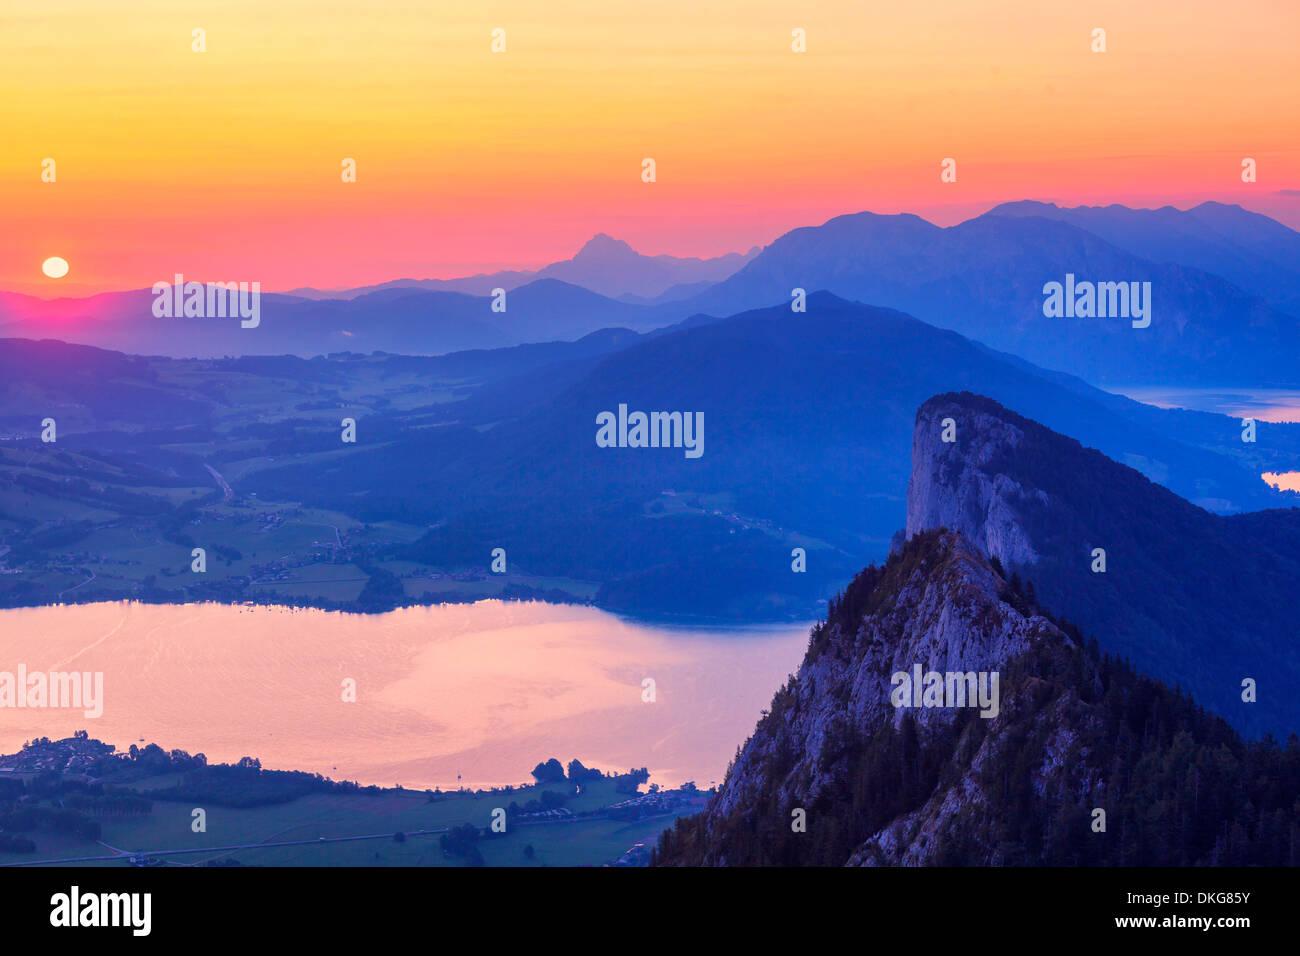 Sunrise over Salzkammergut Mountains and Mondsee, Salzburger Land, Austria, Europe - Stock Image